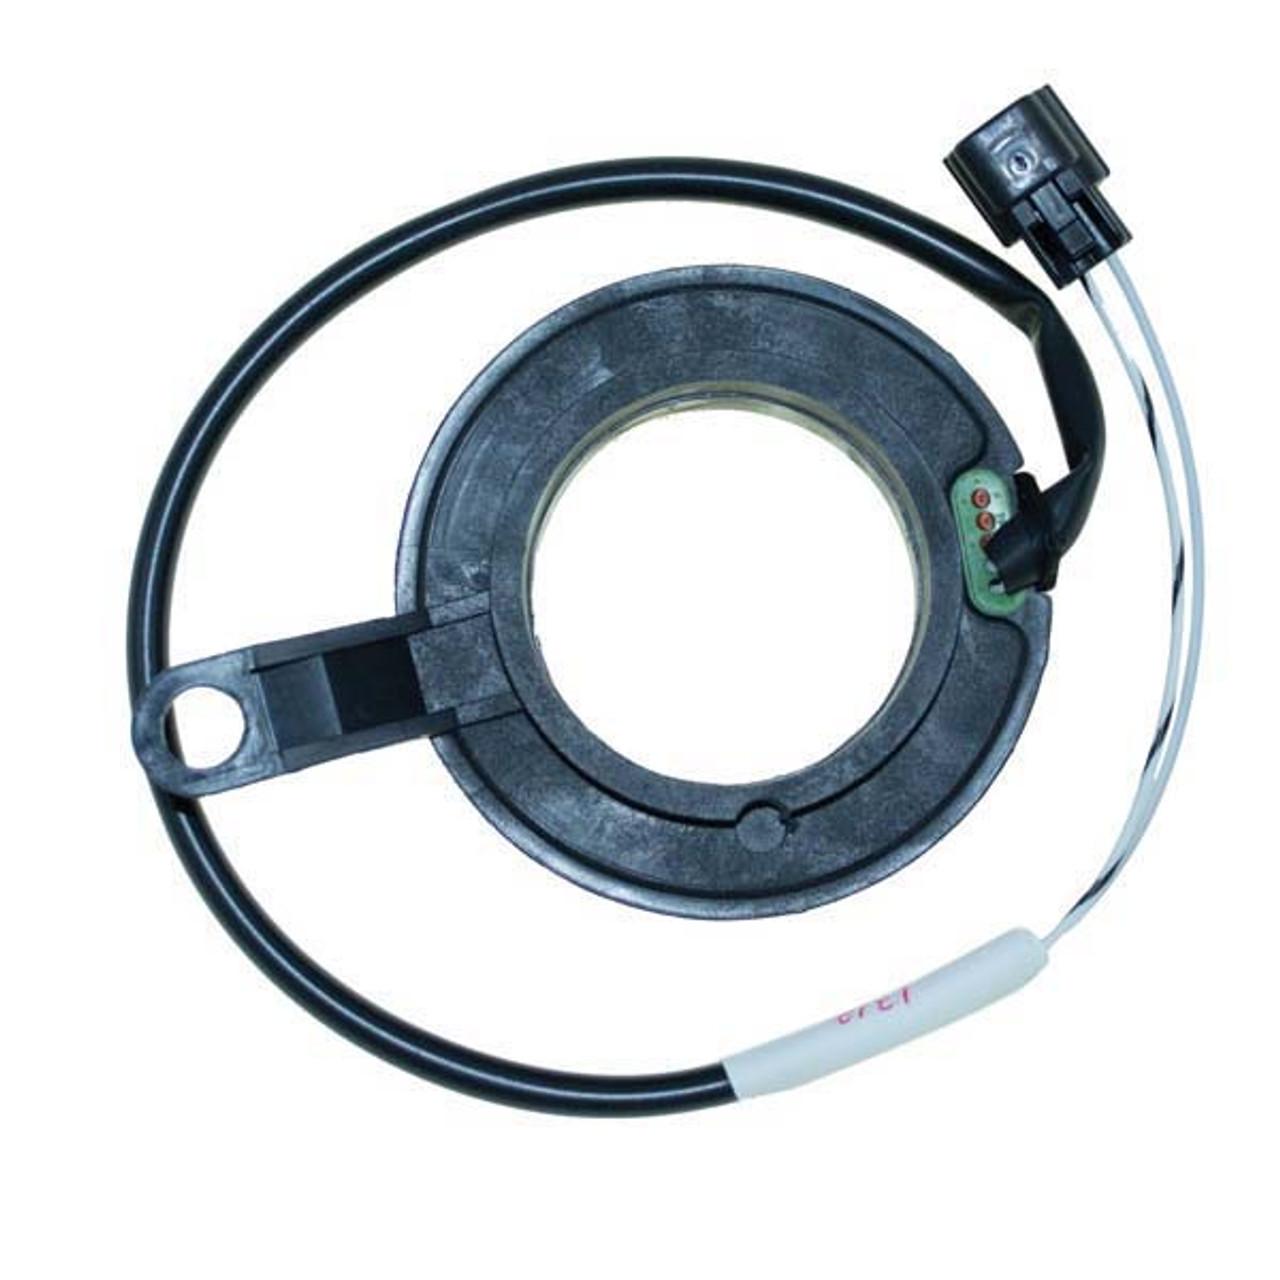 CDI Electronics Trigger-Merc# 817029A 9 134-7029-3